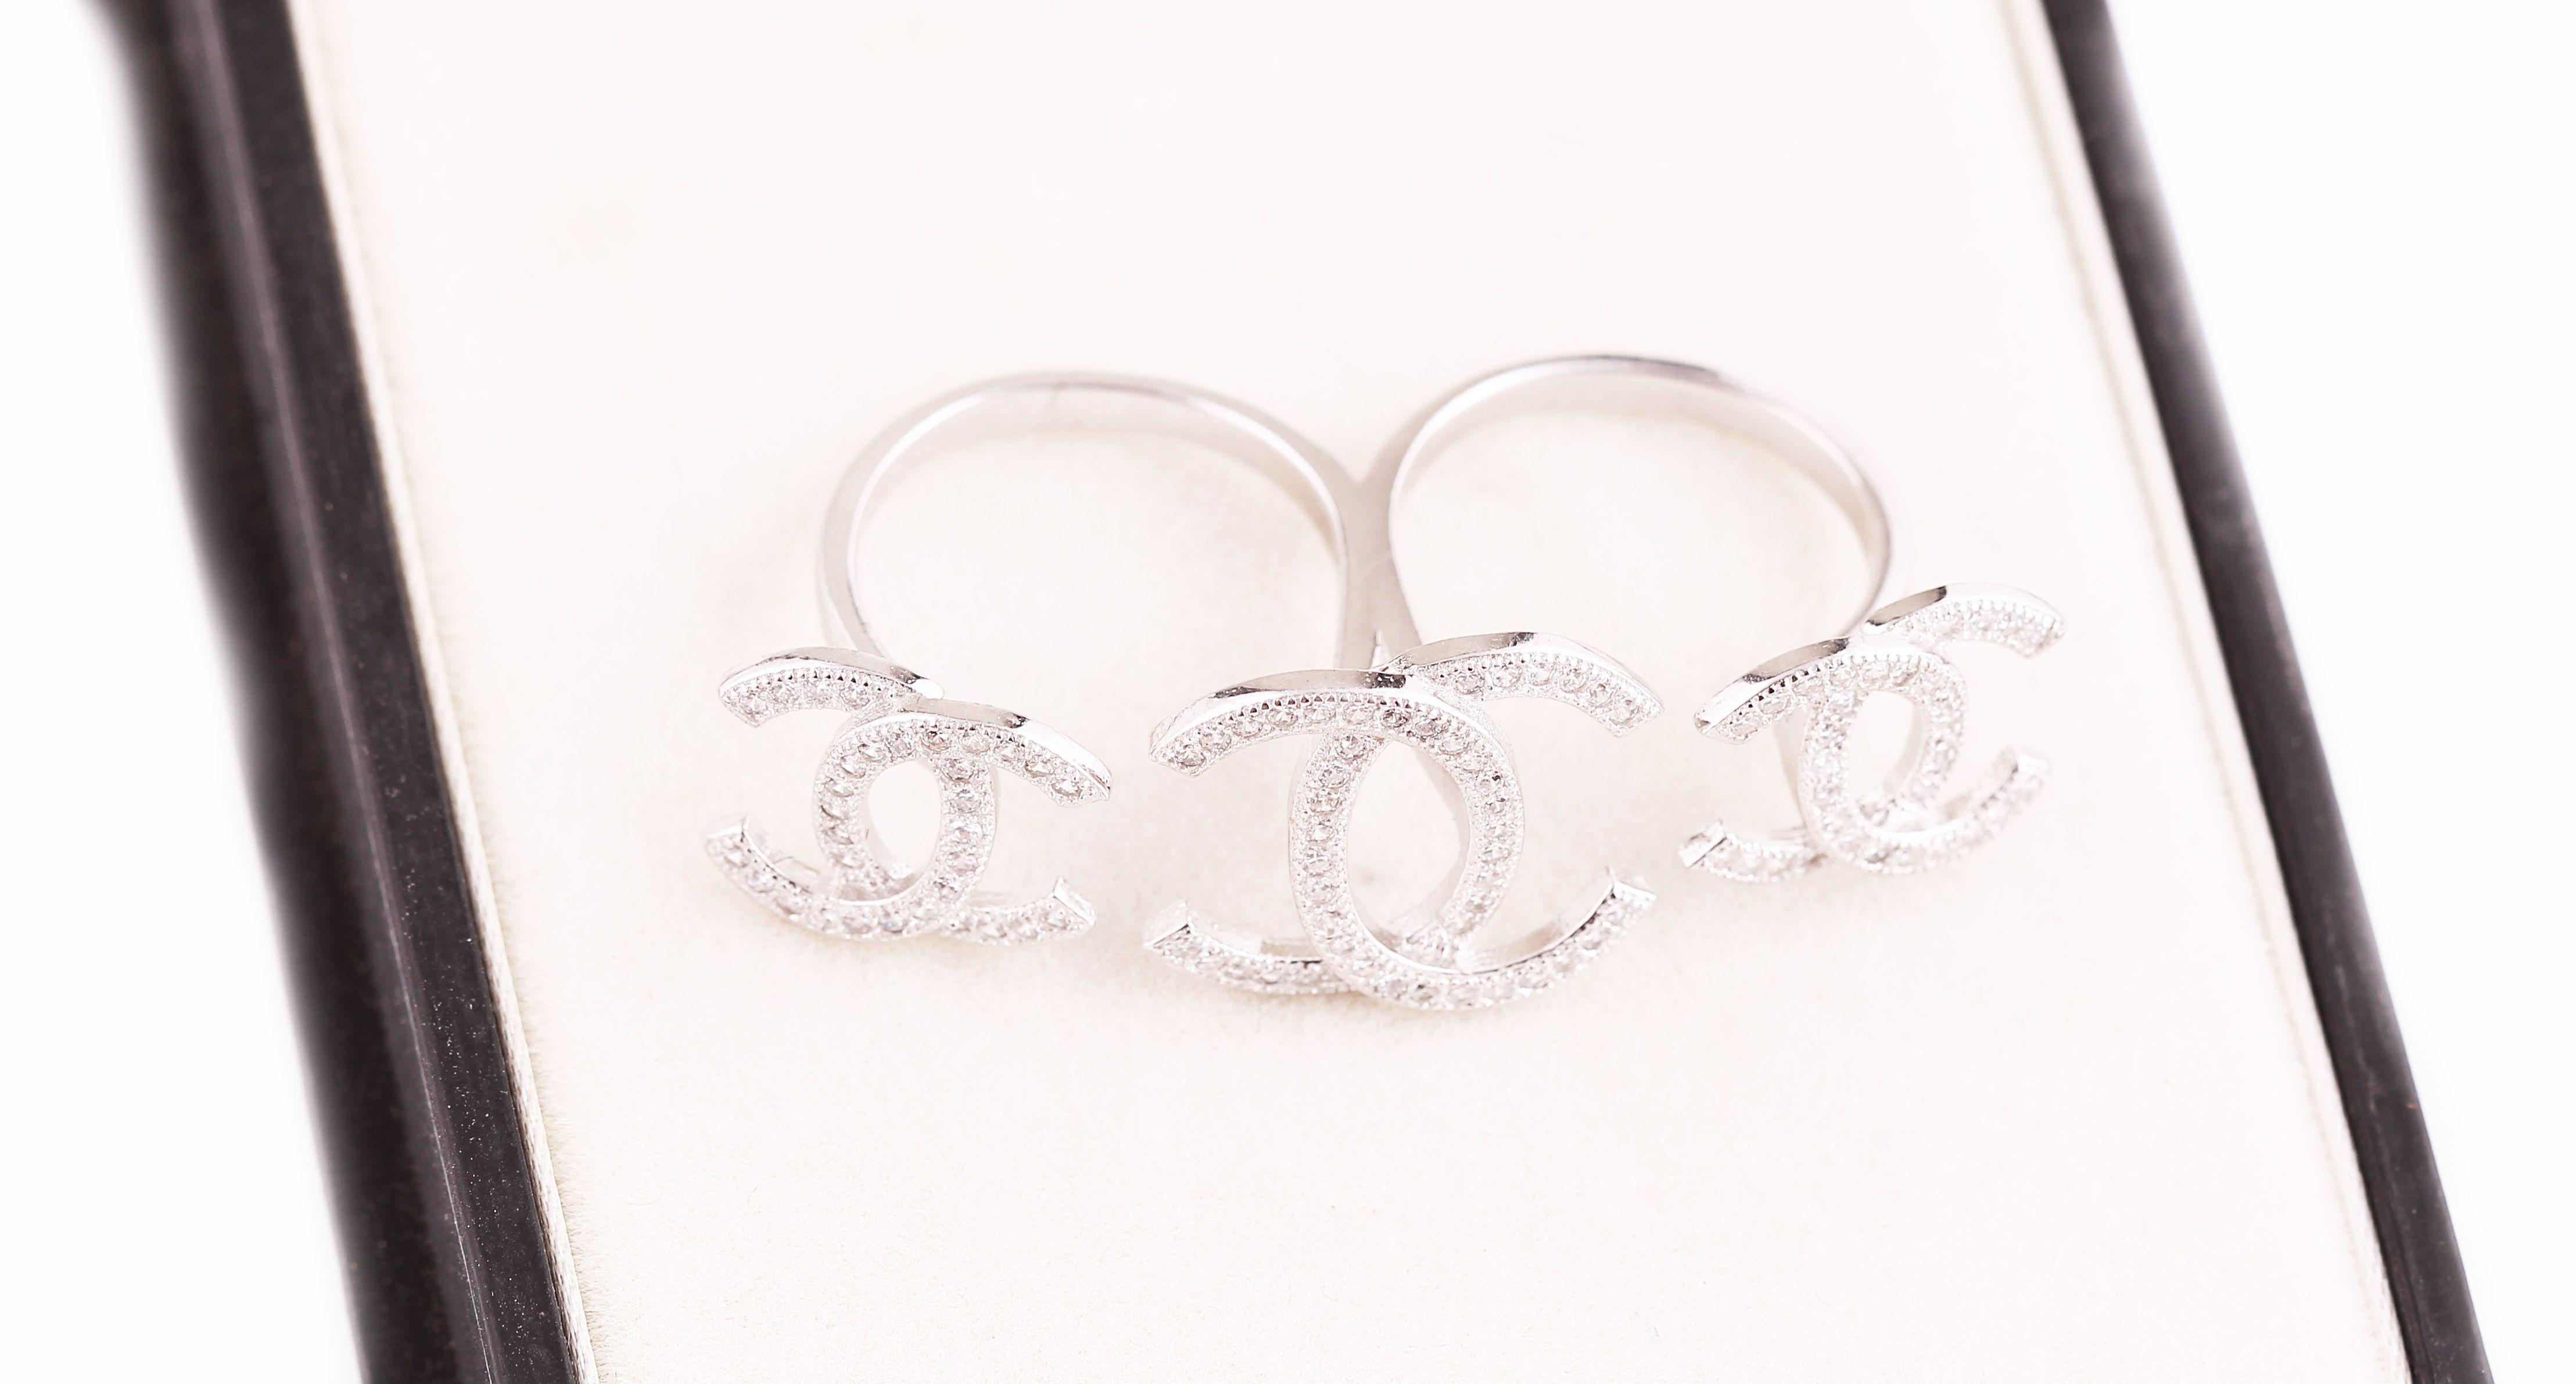 Shree Ji Jewellers 92.5 Silver Cubic zirconia Couple Bands